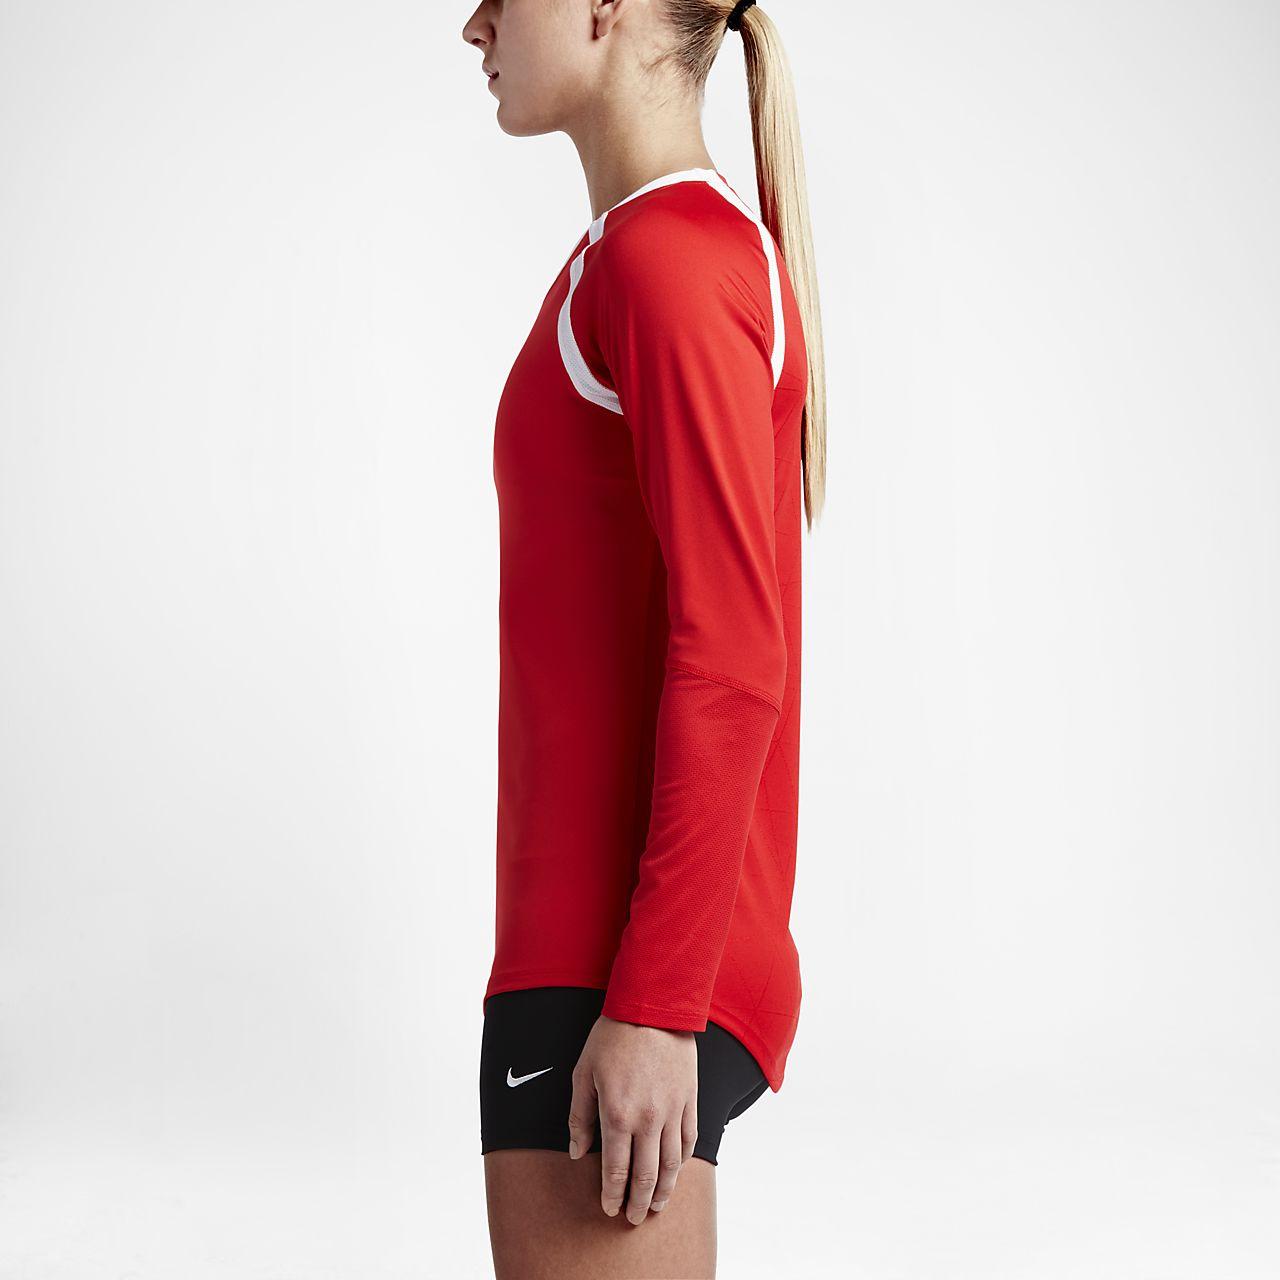 ecf546764349 Nike Agility Stock Women s Game Jersey. Nike.com